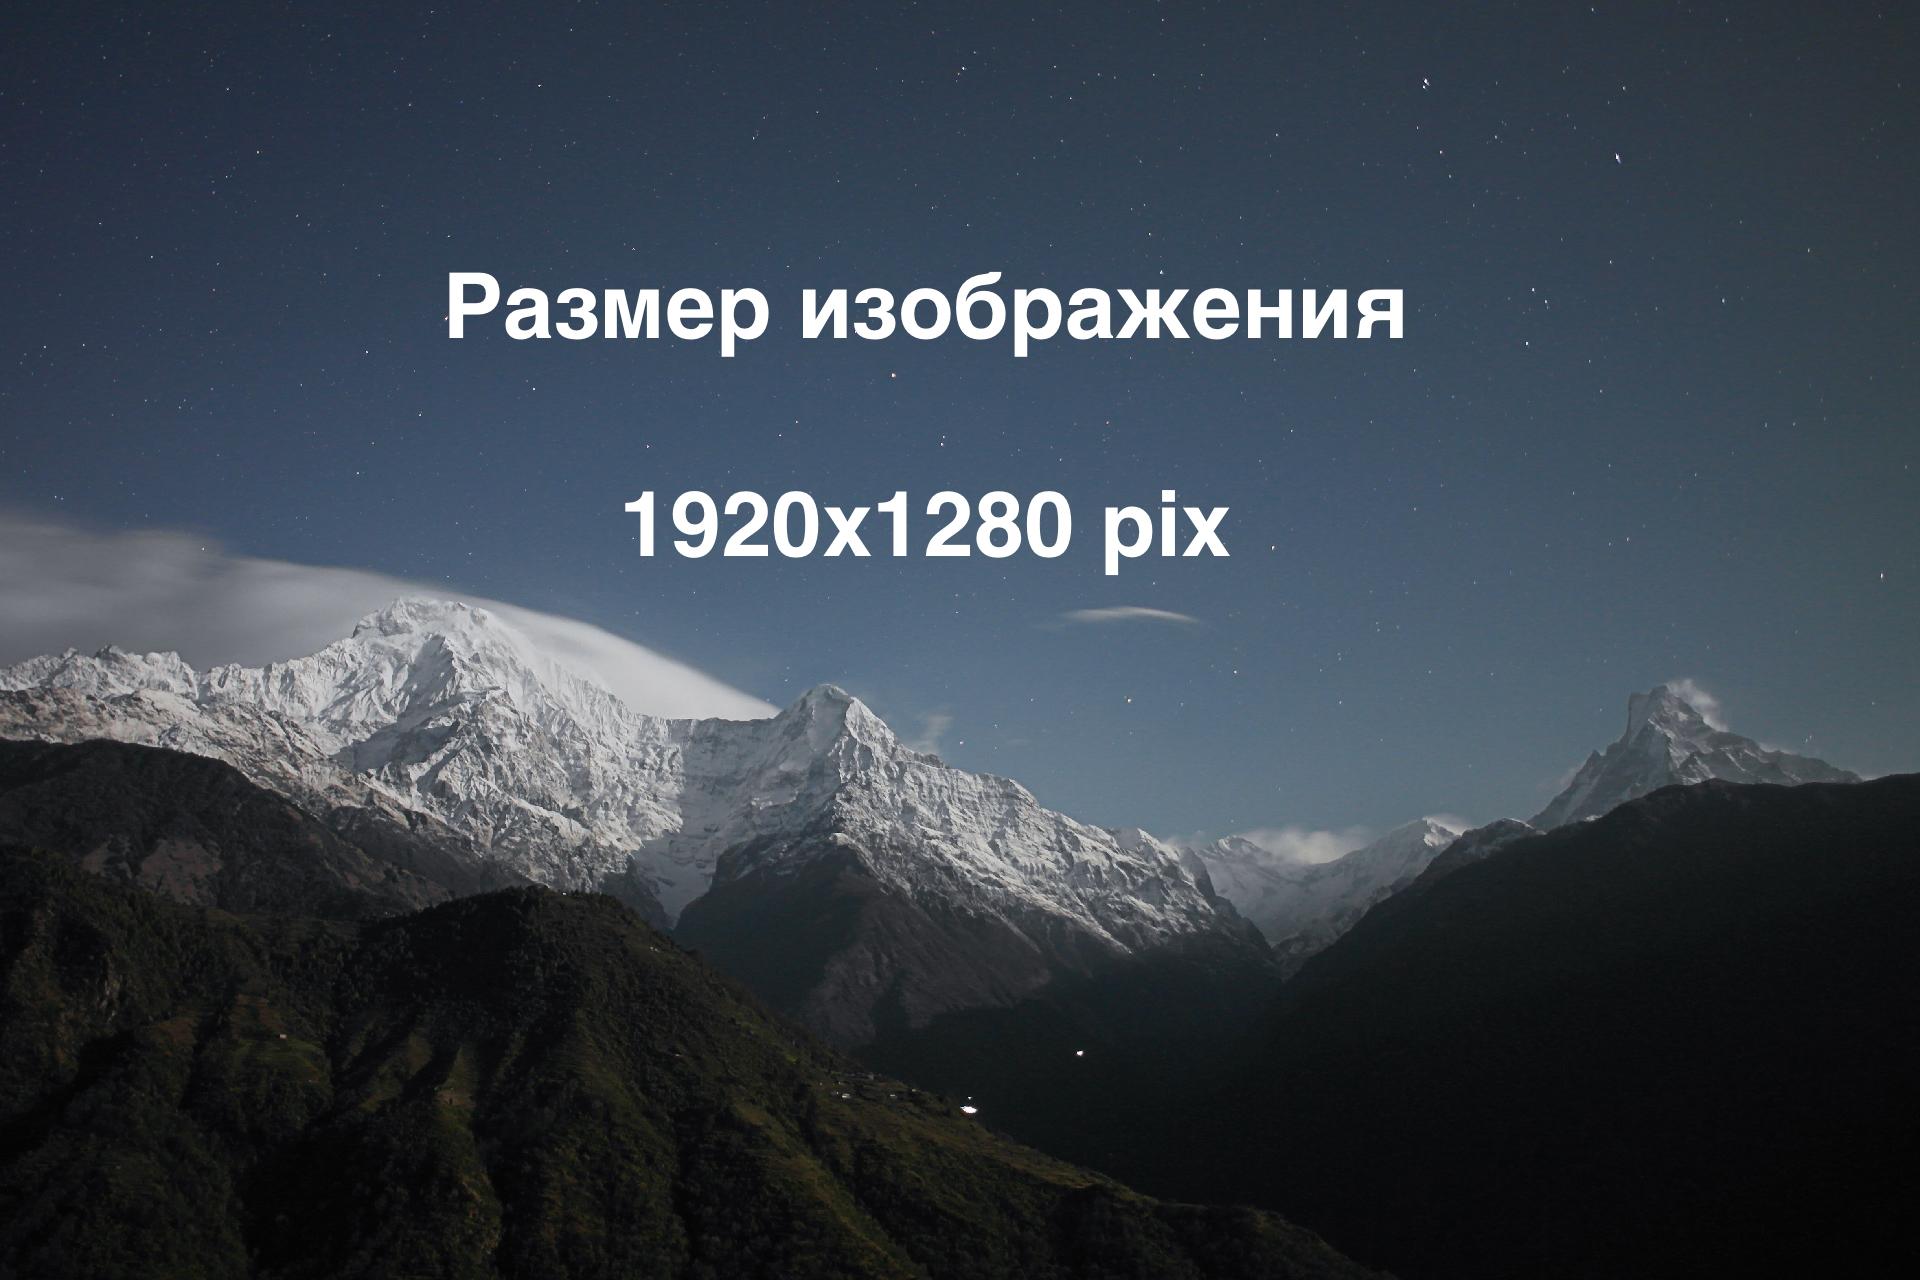 плагин wordpress, русский плагин wordpress,